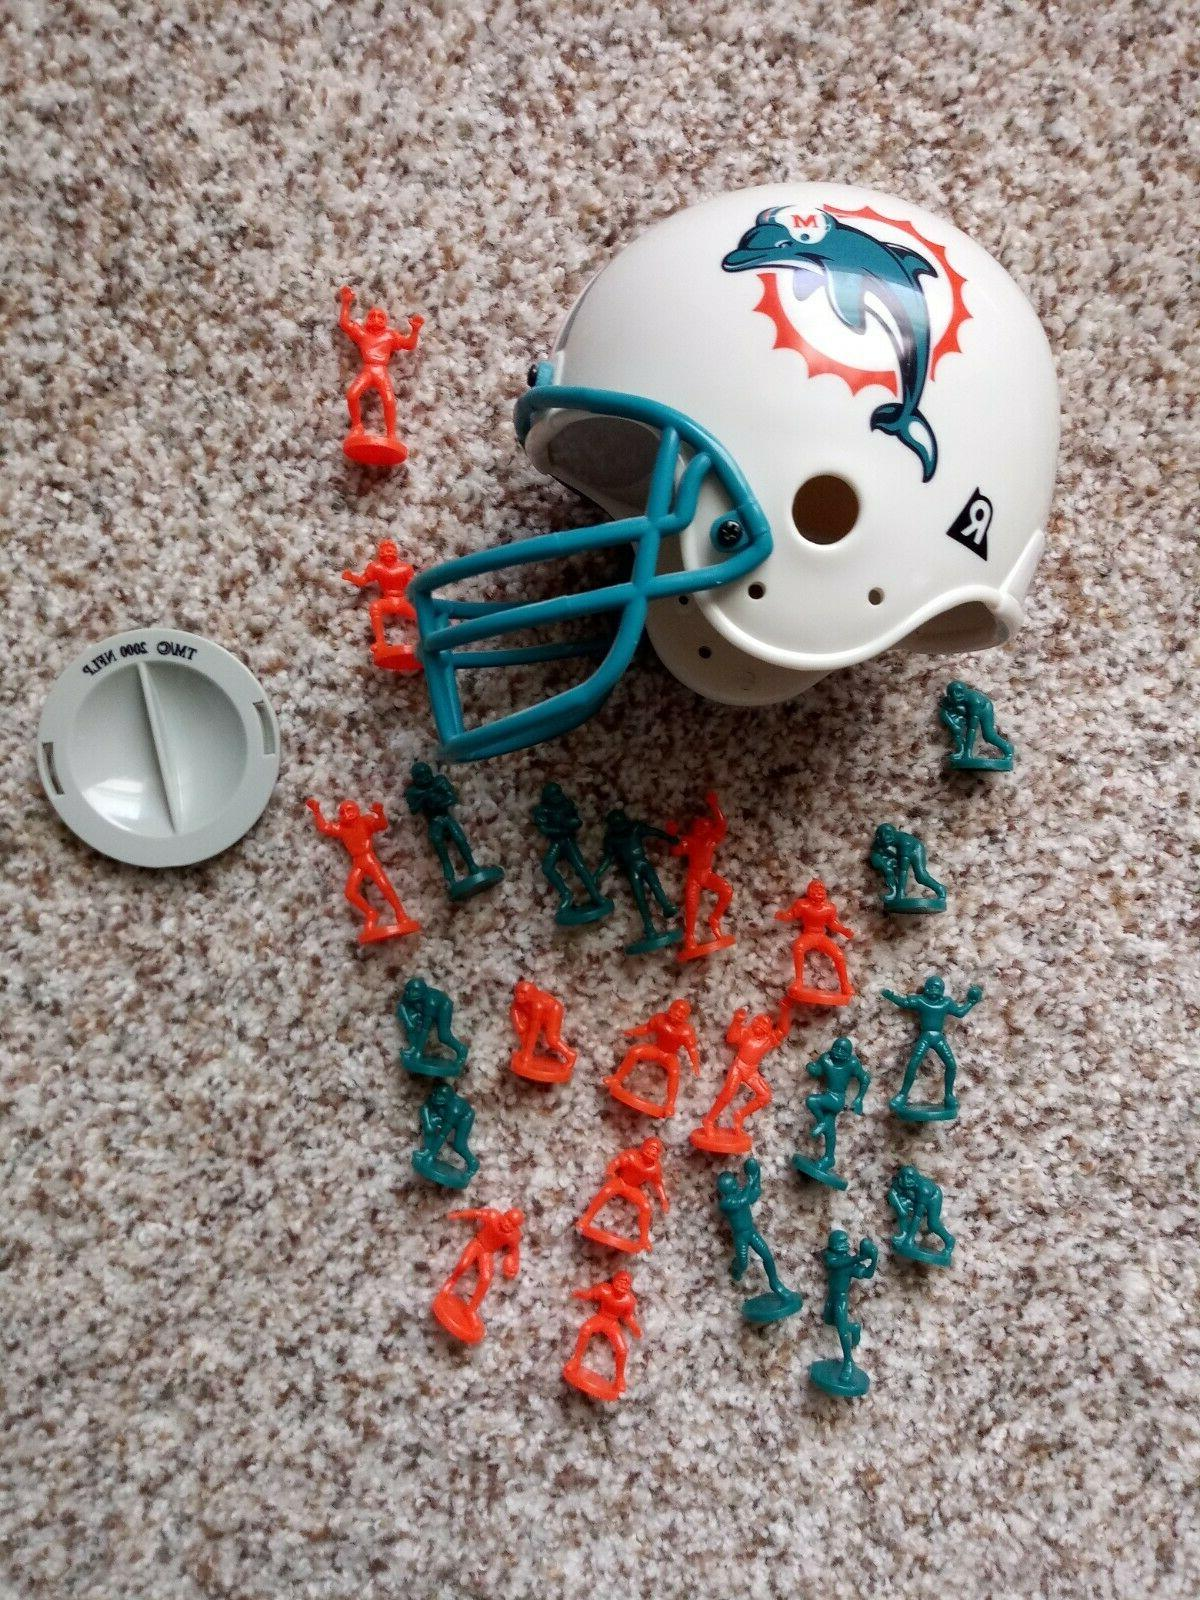 miami dolphins mini helmet with mini players